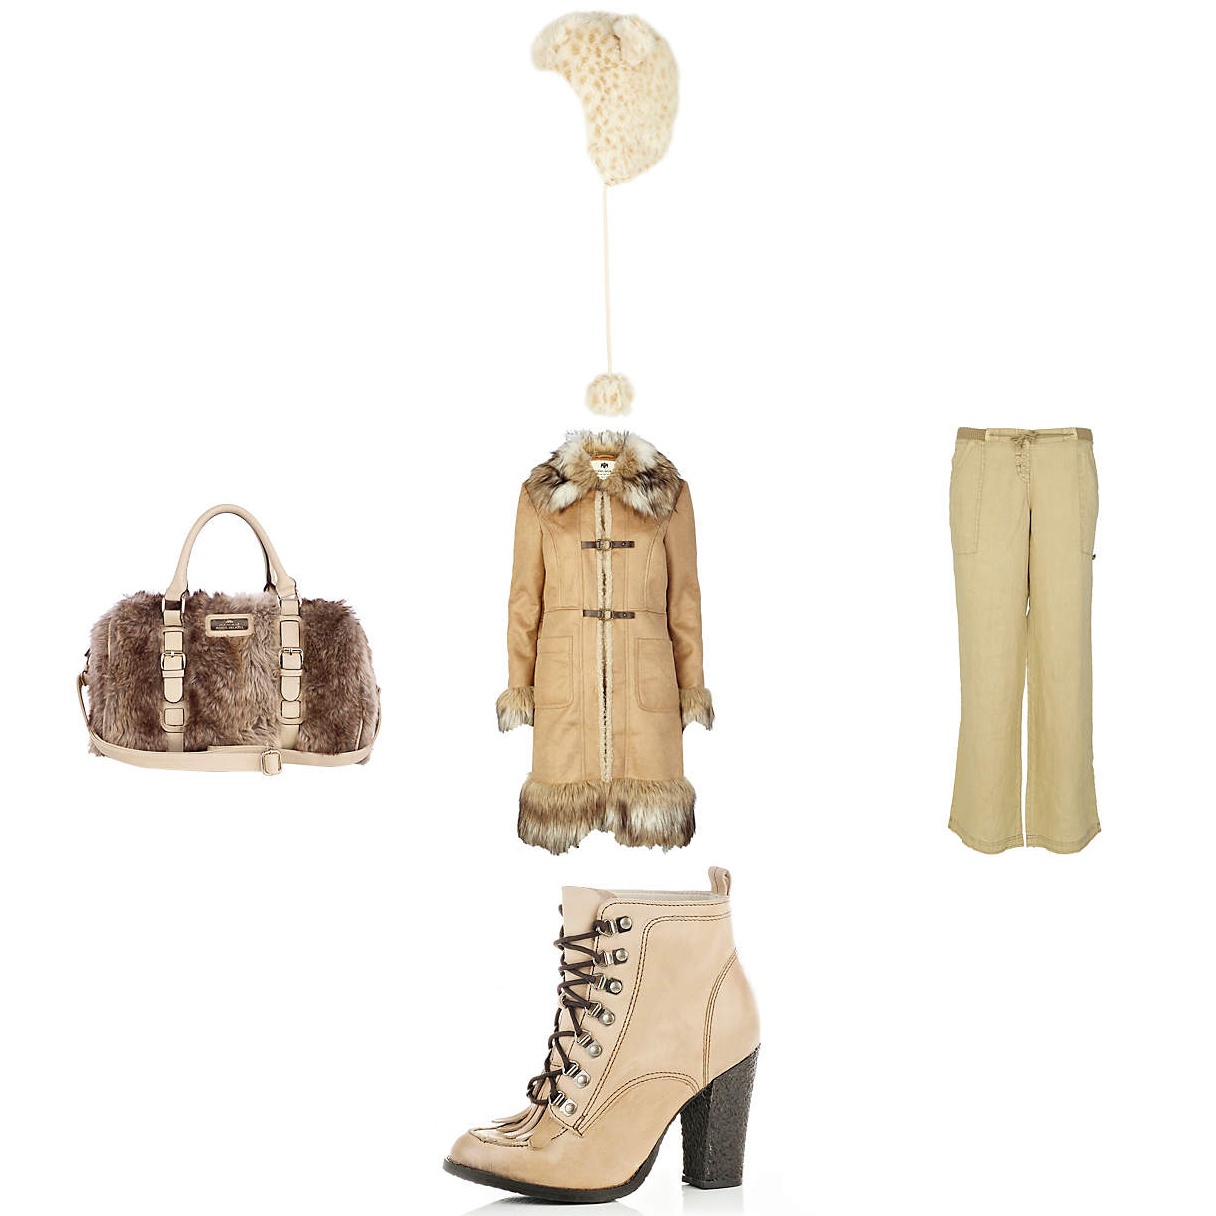 Yunaosity: Autum/Winter fashion